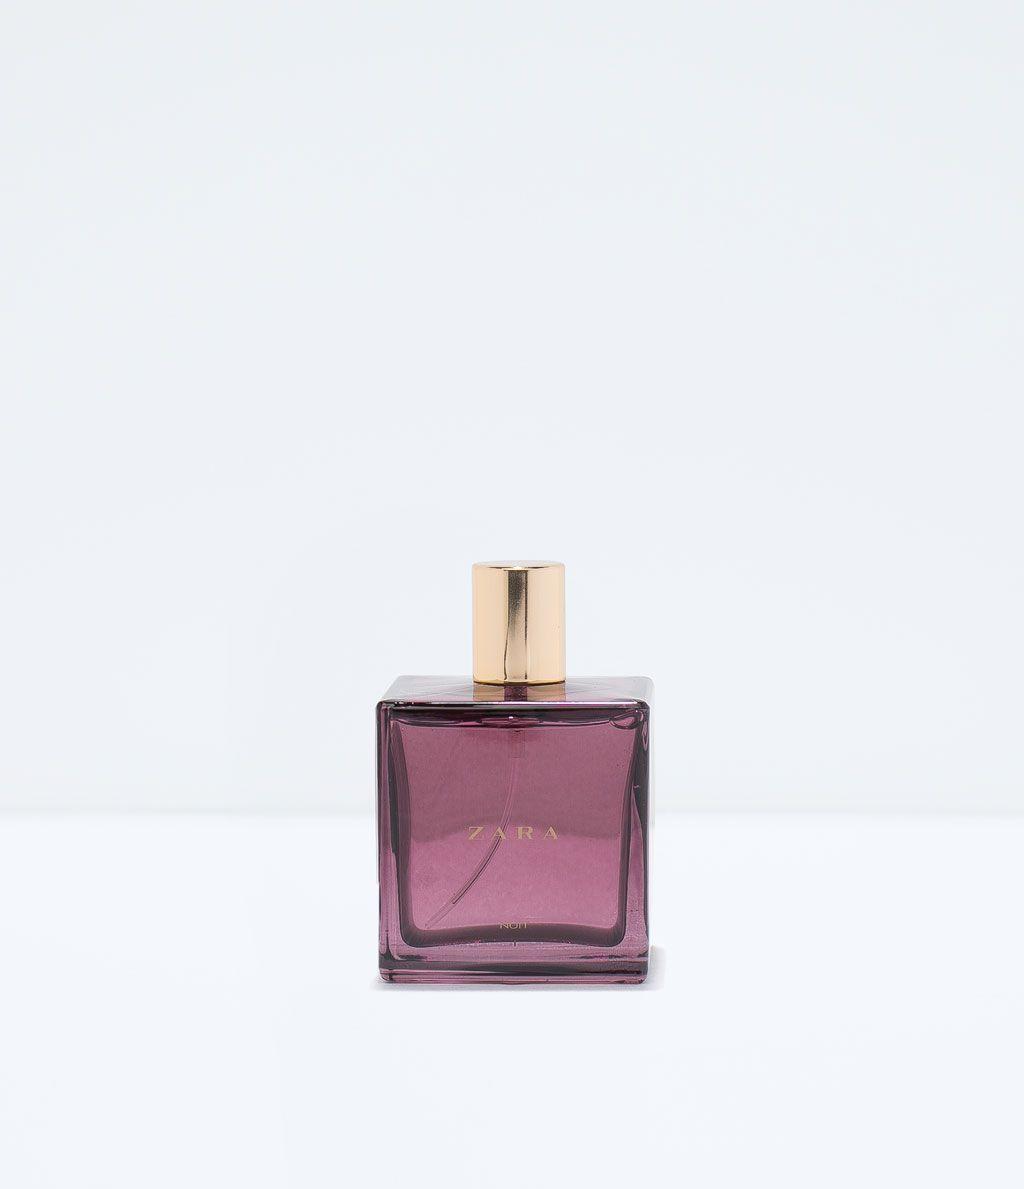 Zara Woman Zara Nuit Eau De Parfum 100 Ml Hair Make Up